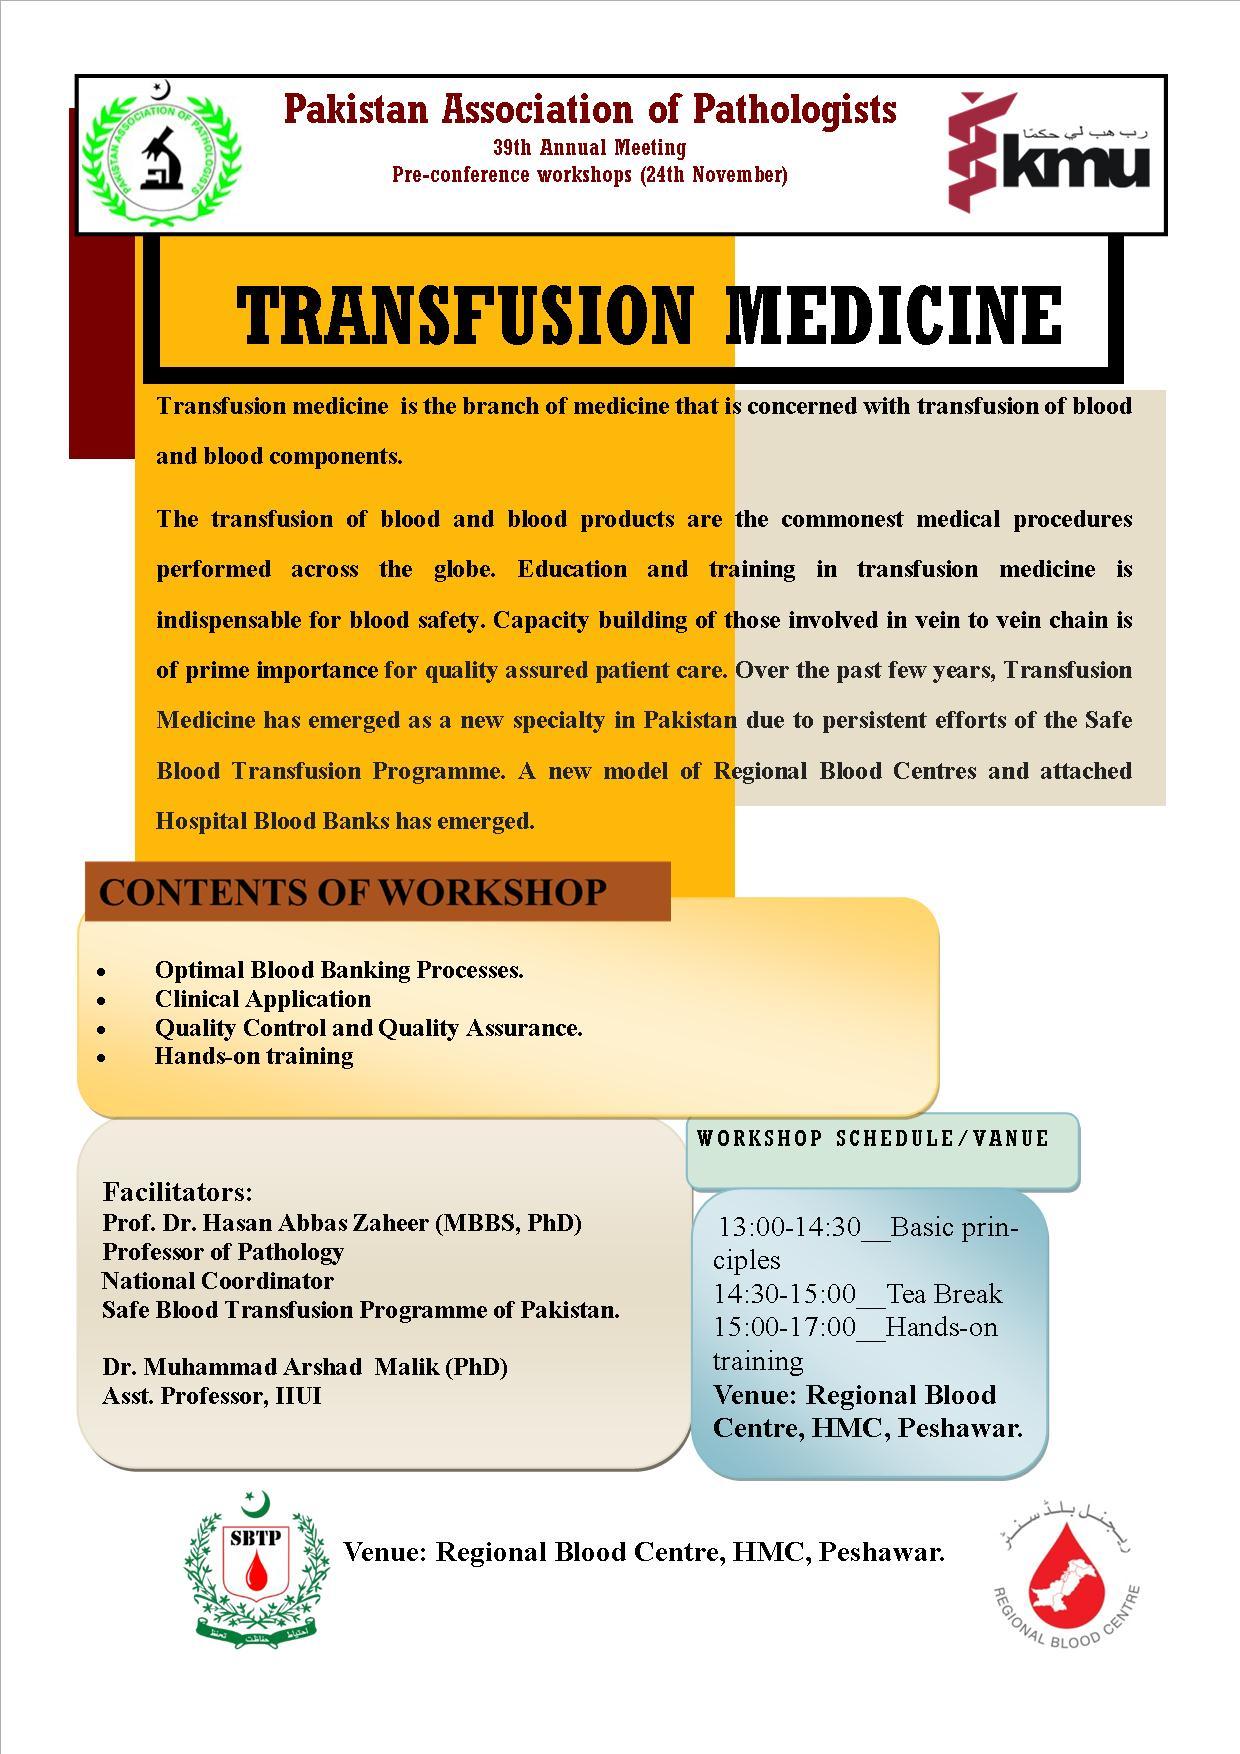 transfusion-medicine